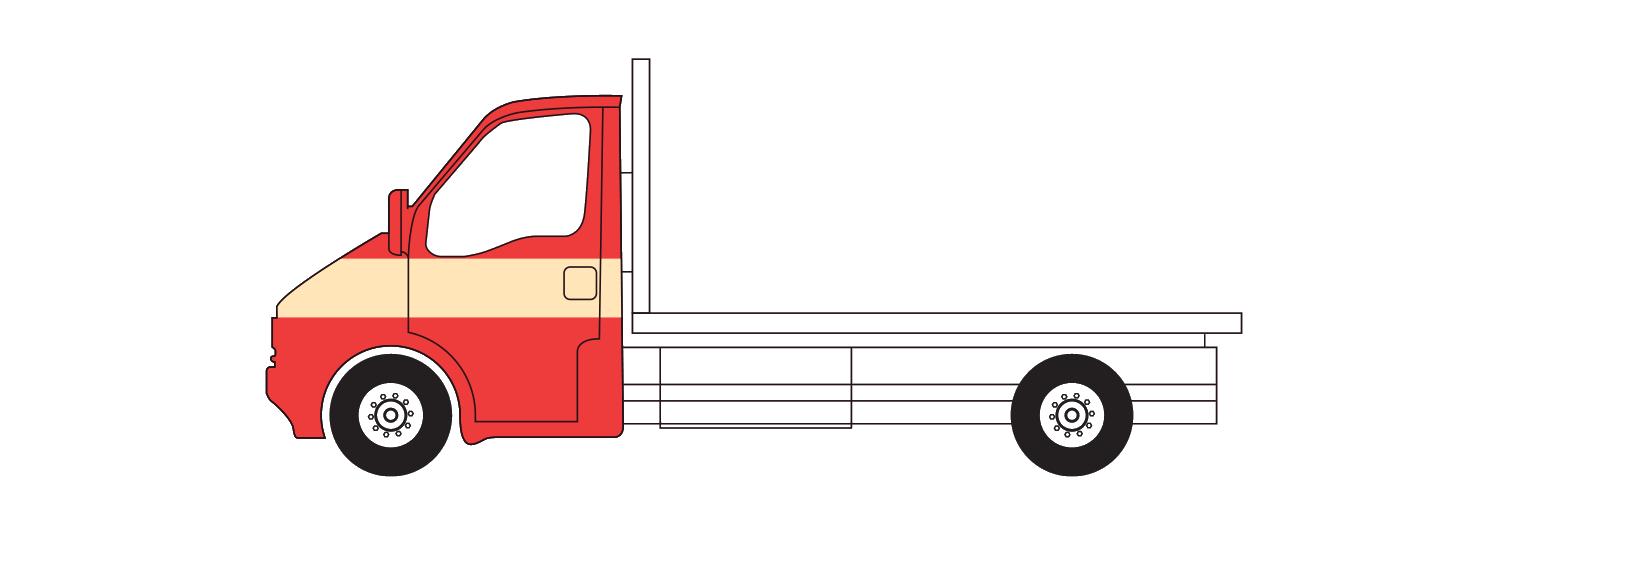 Uk and european transport. Crane clipart heavy vehicle